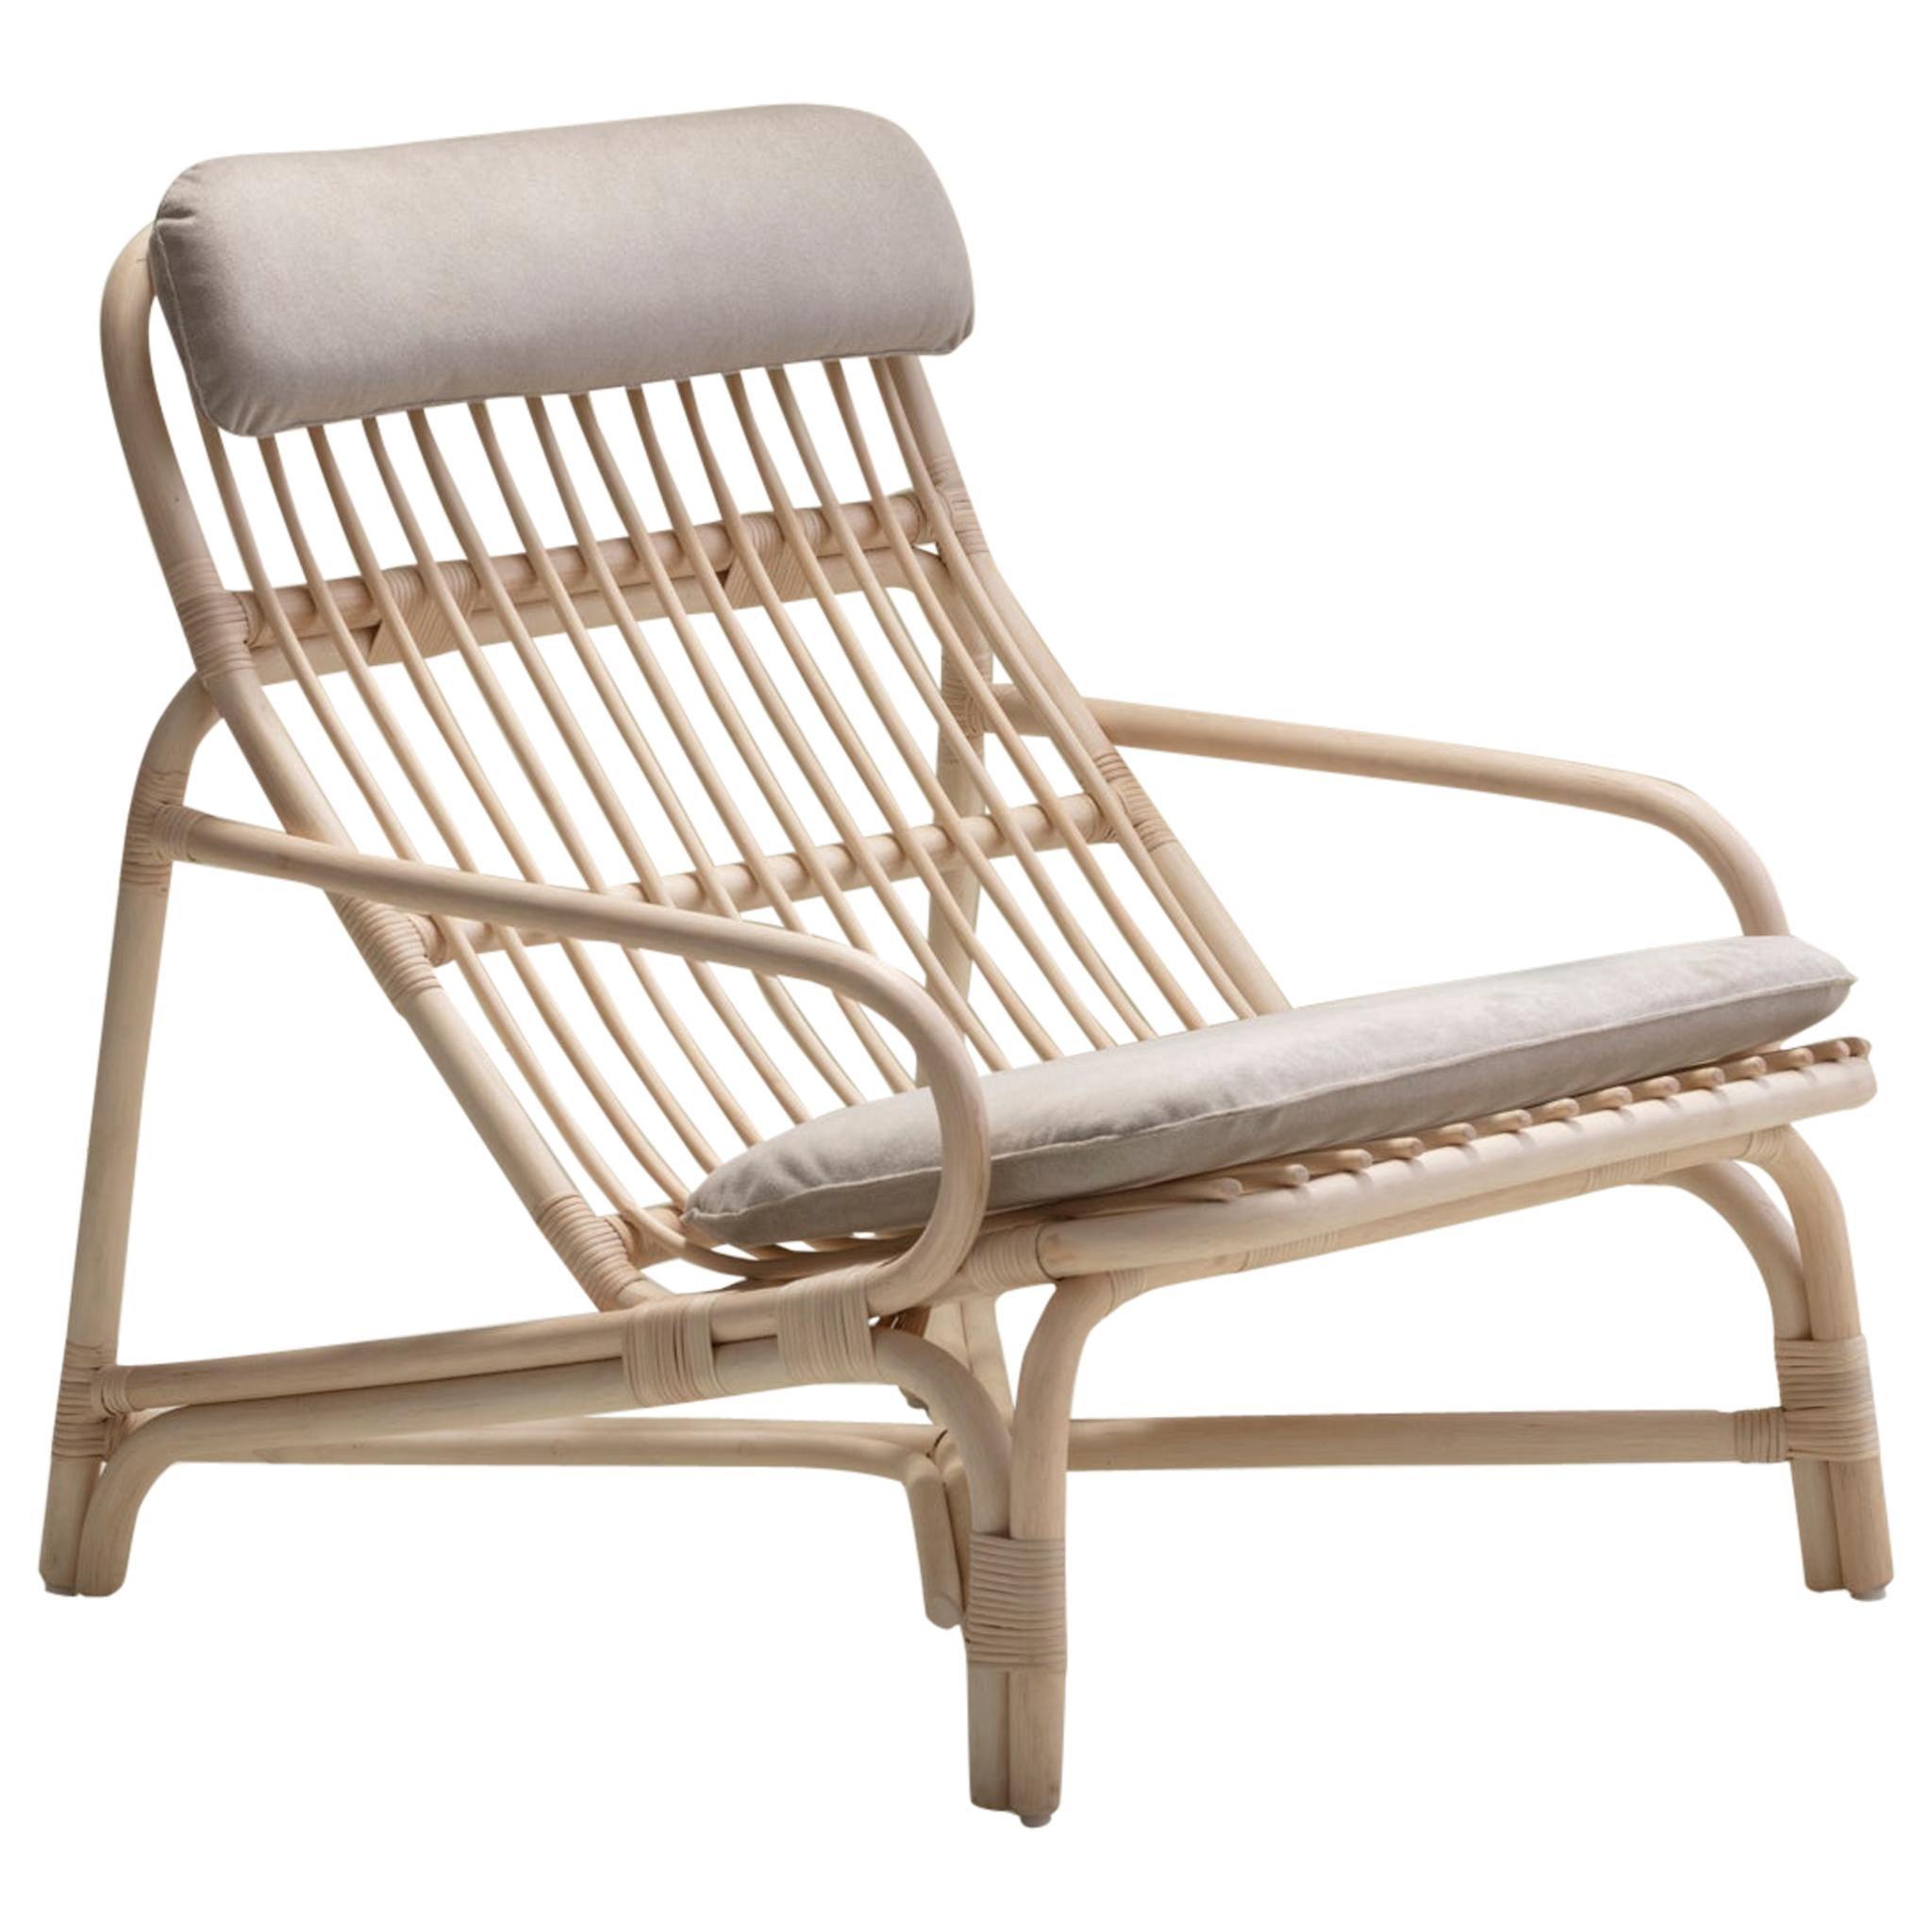 Handmade Natural Rattan Camelia Lounge Chair 'Cushioned'